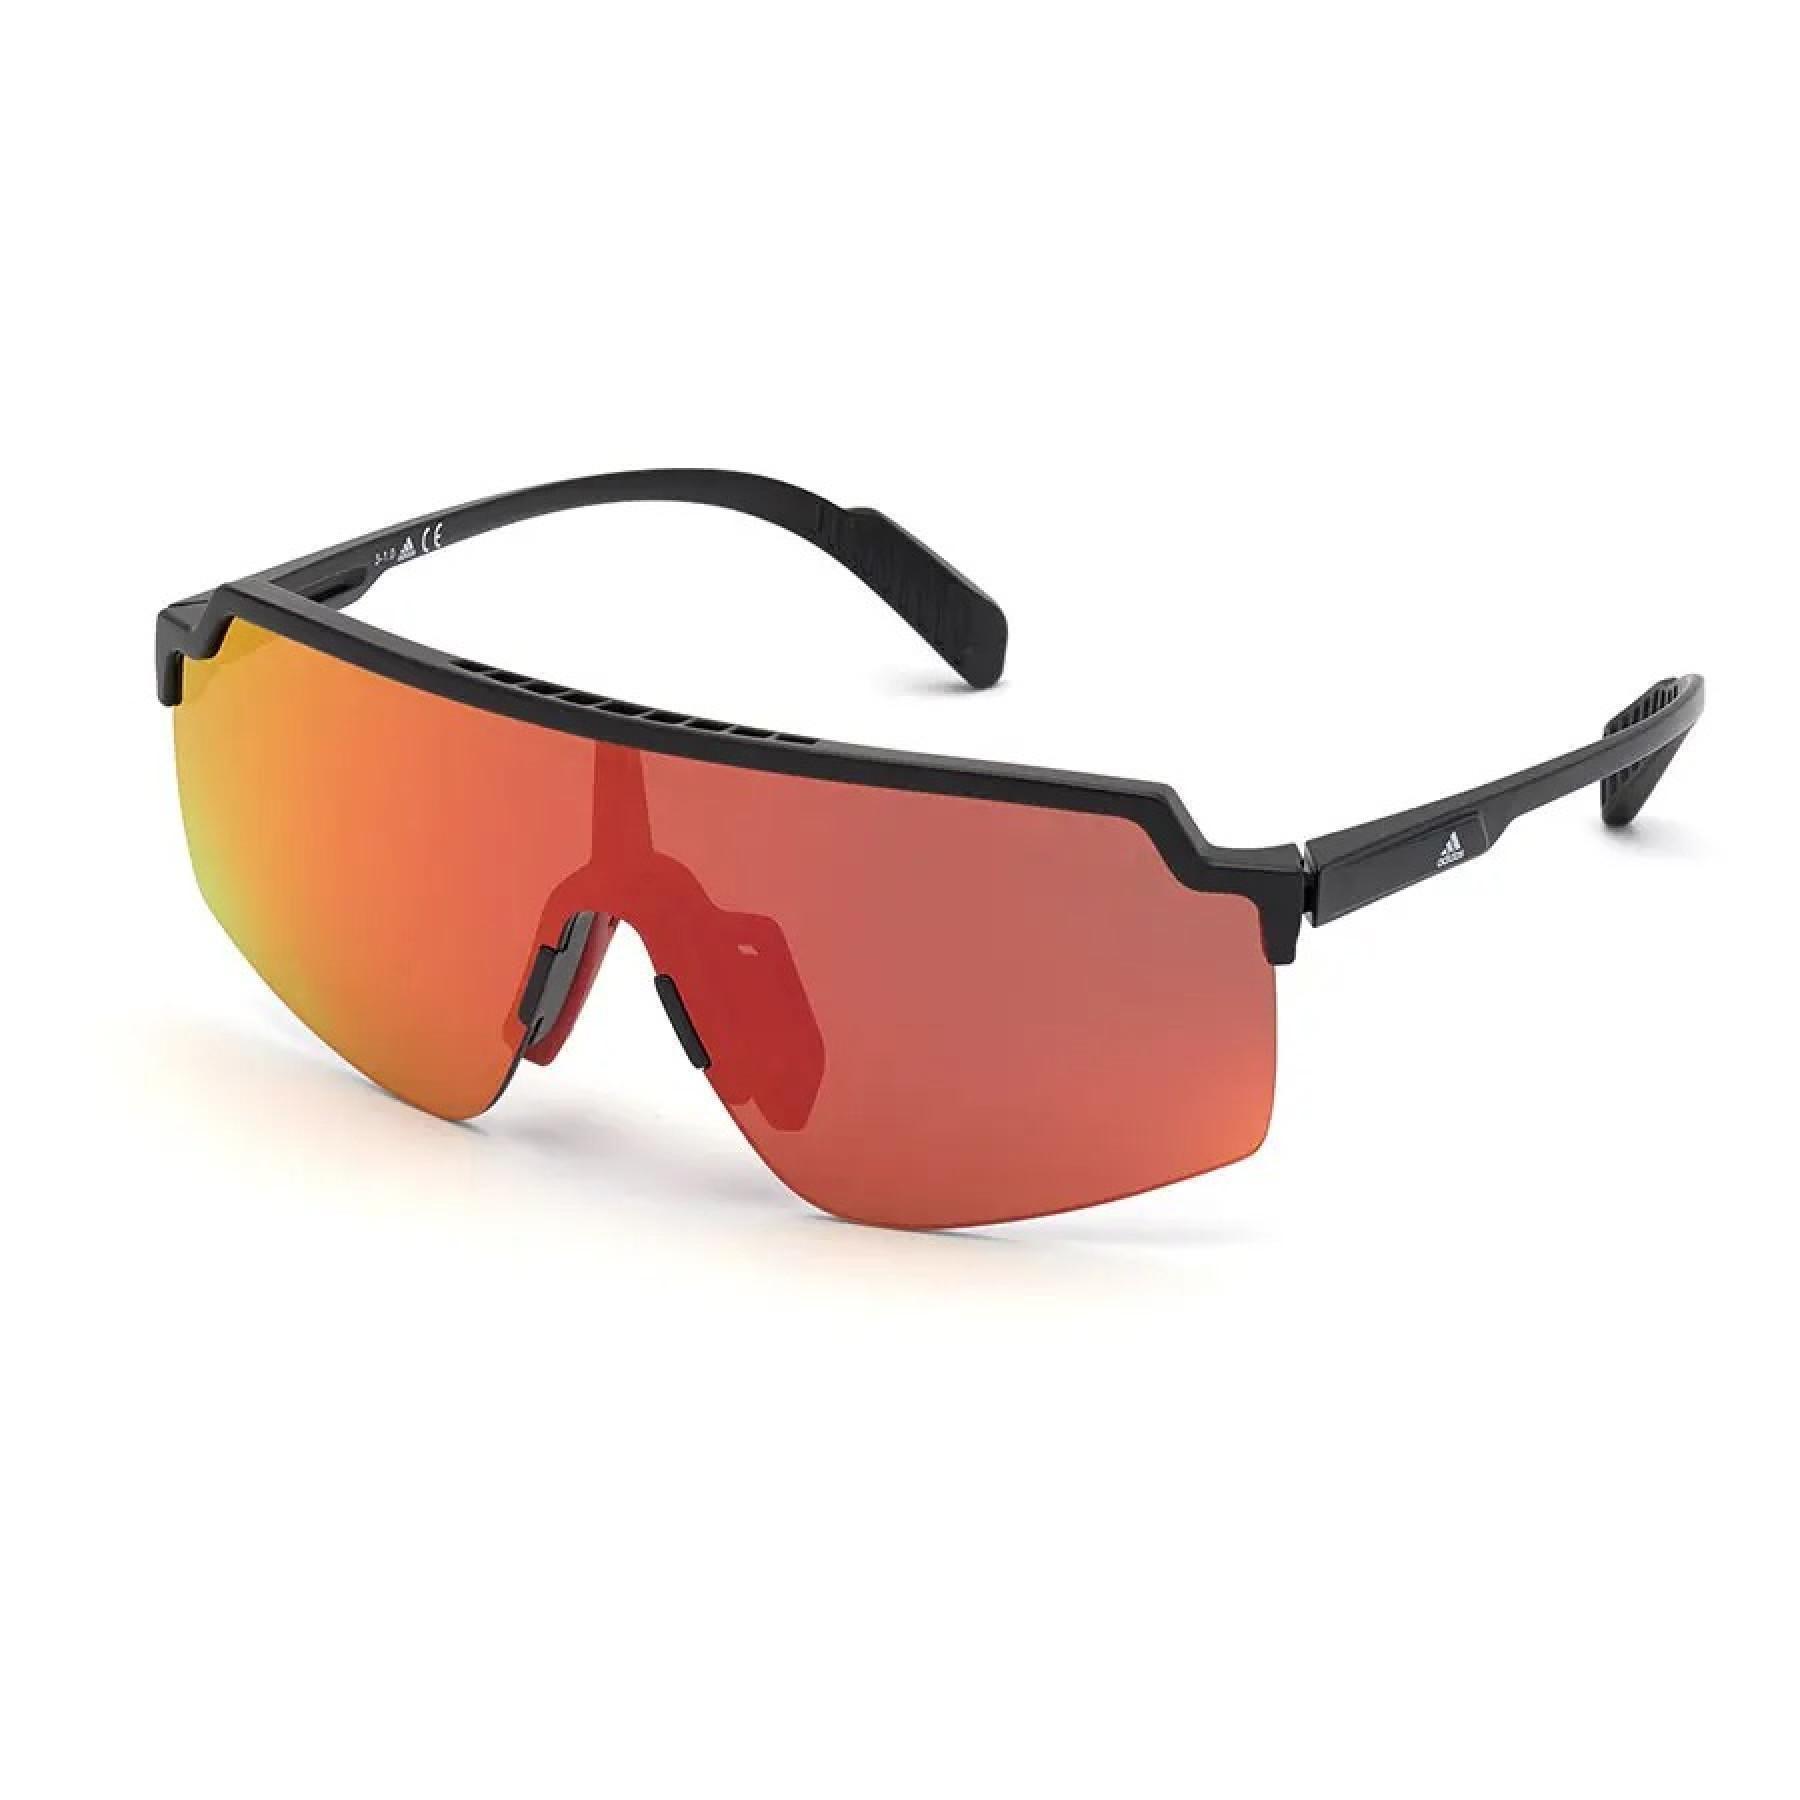 Sunglasses Adidas Performance